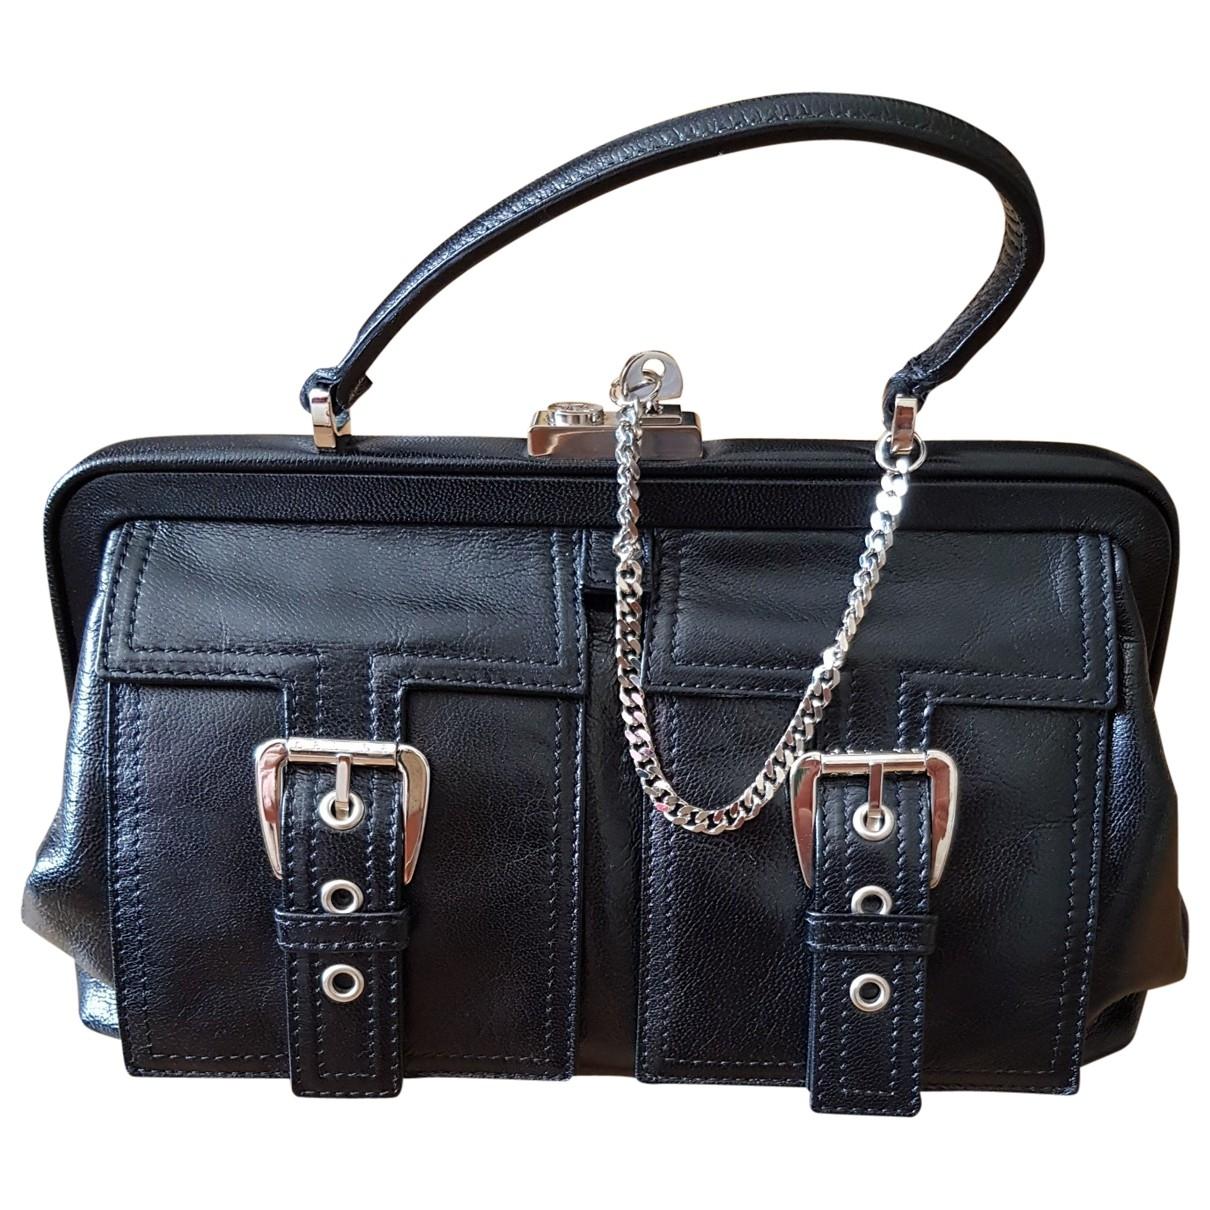 Celine \N Handtasche in  Schwarz Leder